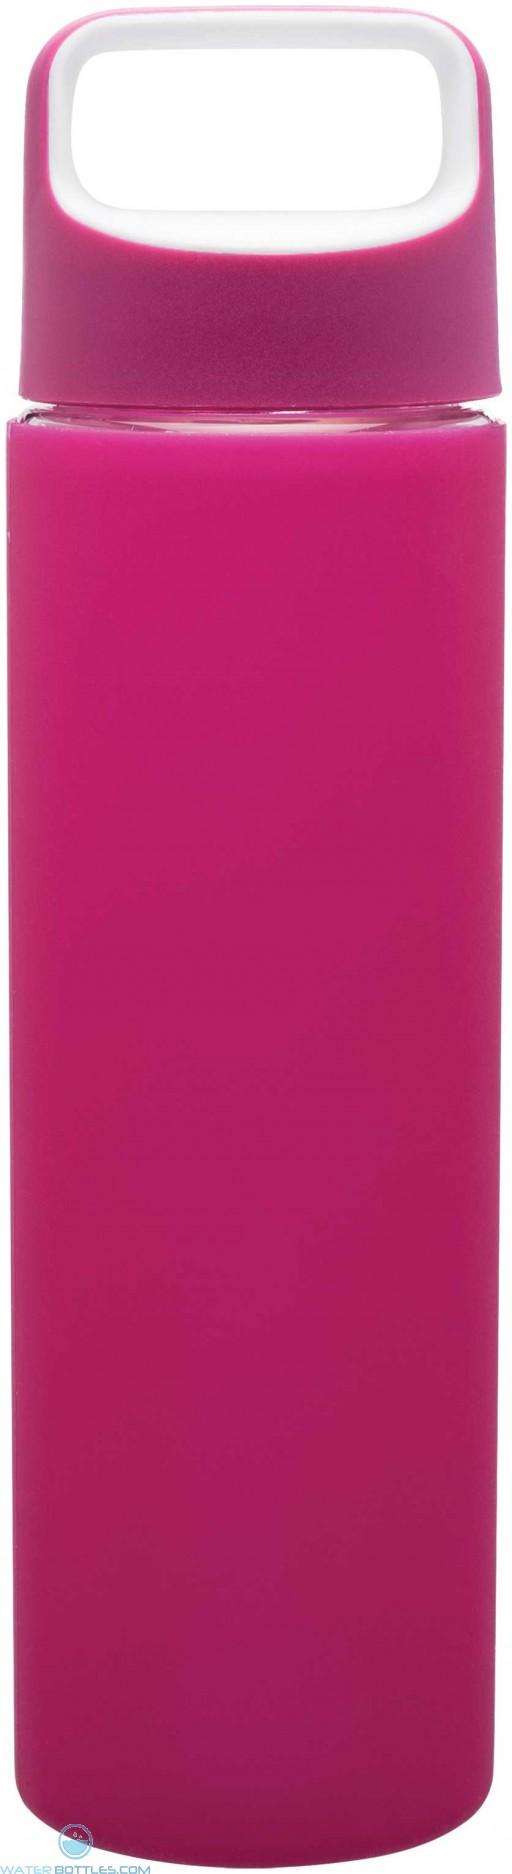 H2Go Inspire Glass Water Bottles | 18 oz - Pink